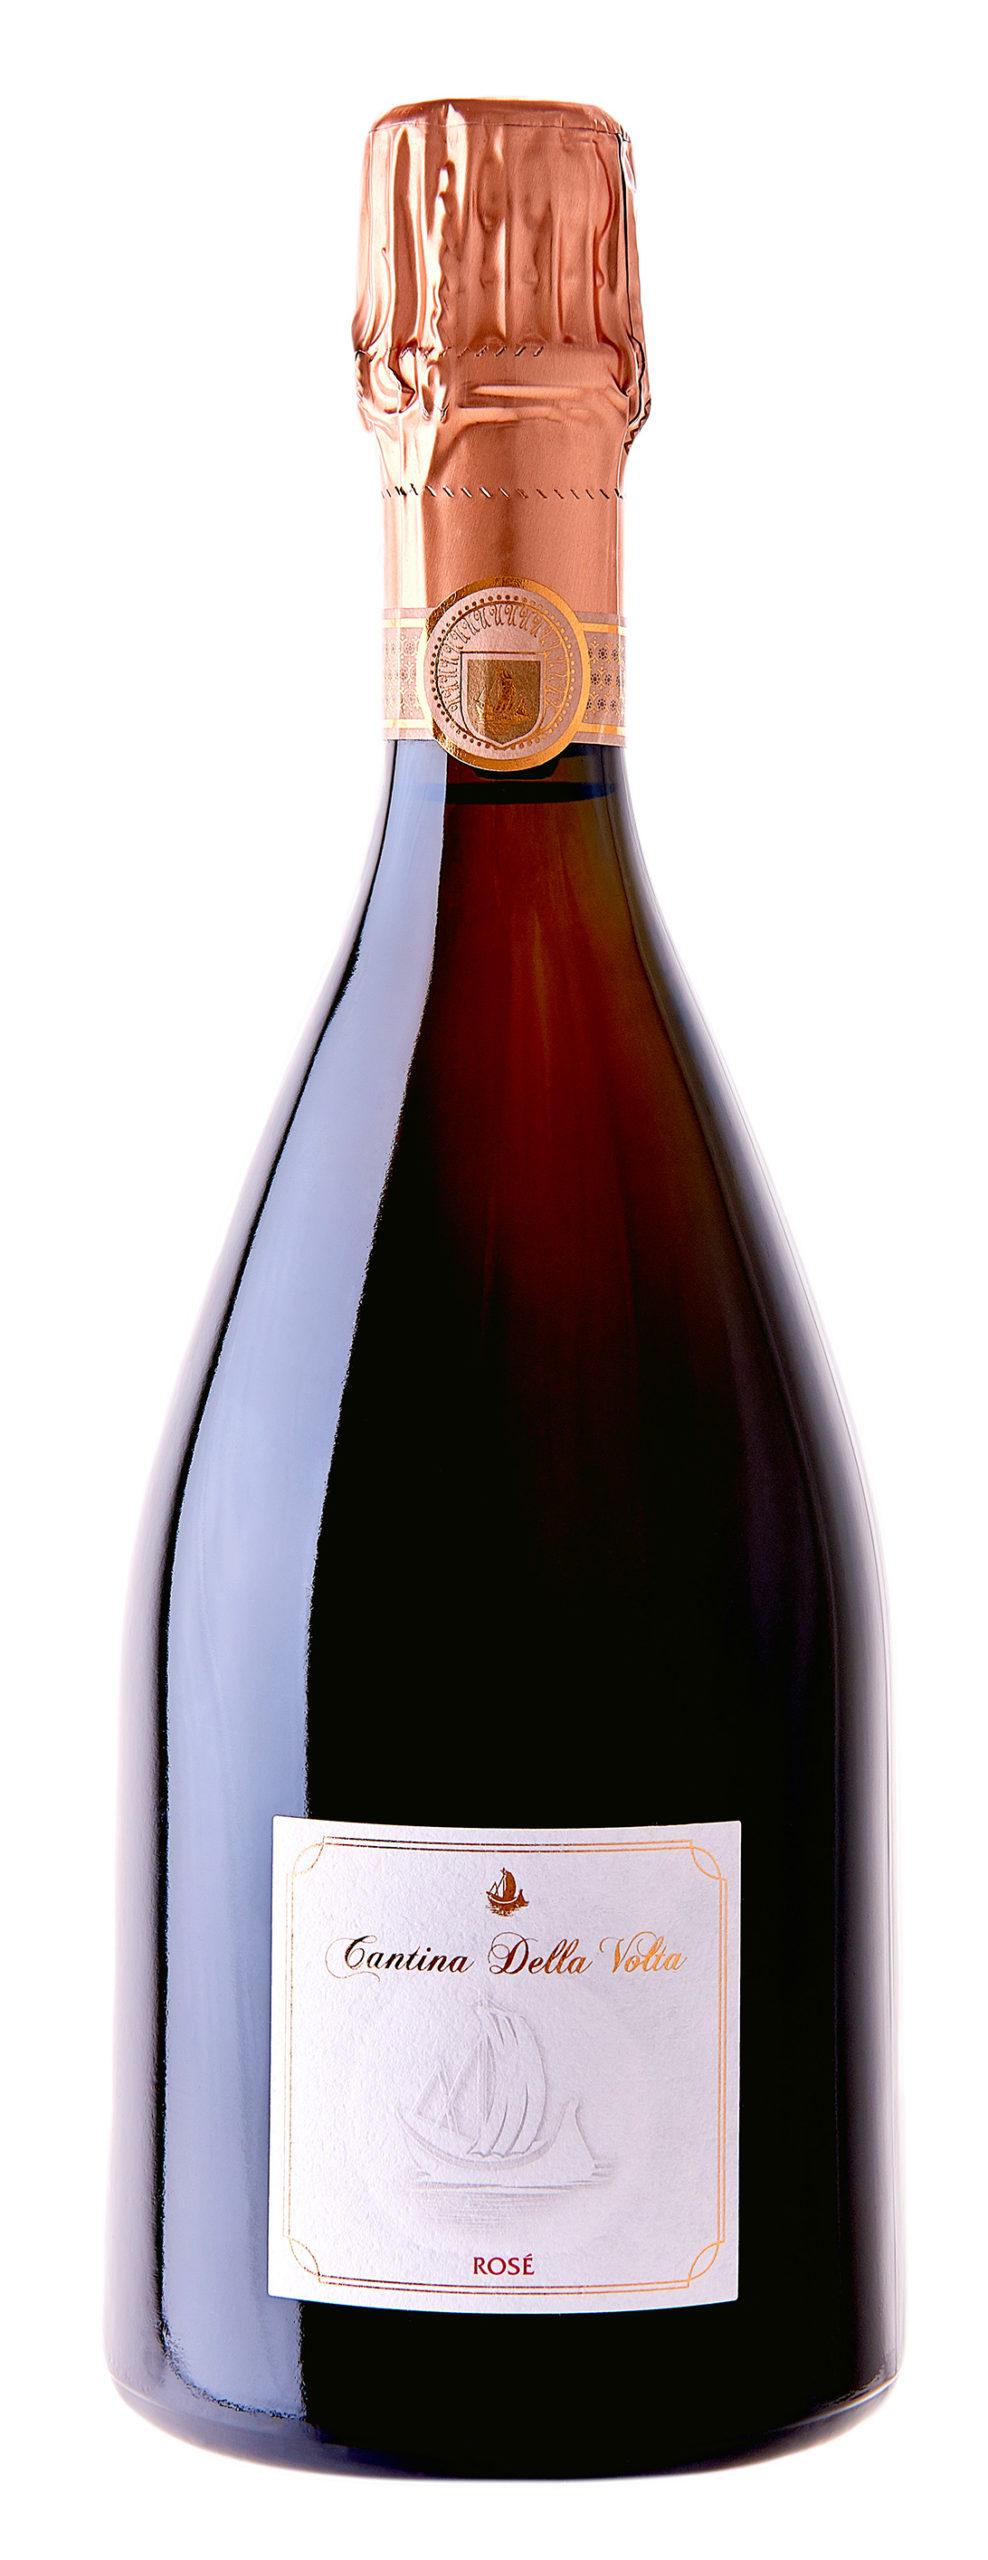 Vino spumante Spumante Metodo Classico Rosè Lambrusco di Sorbara Rosè Brut 2010